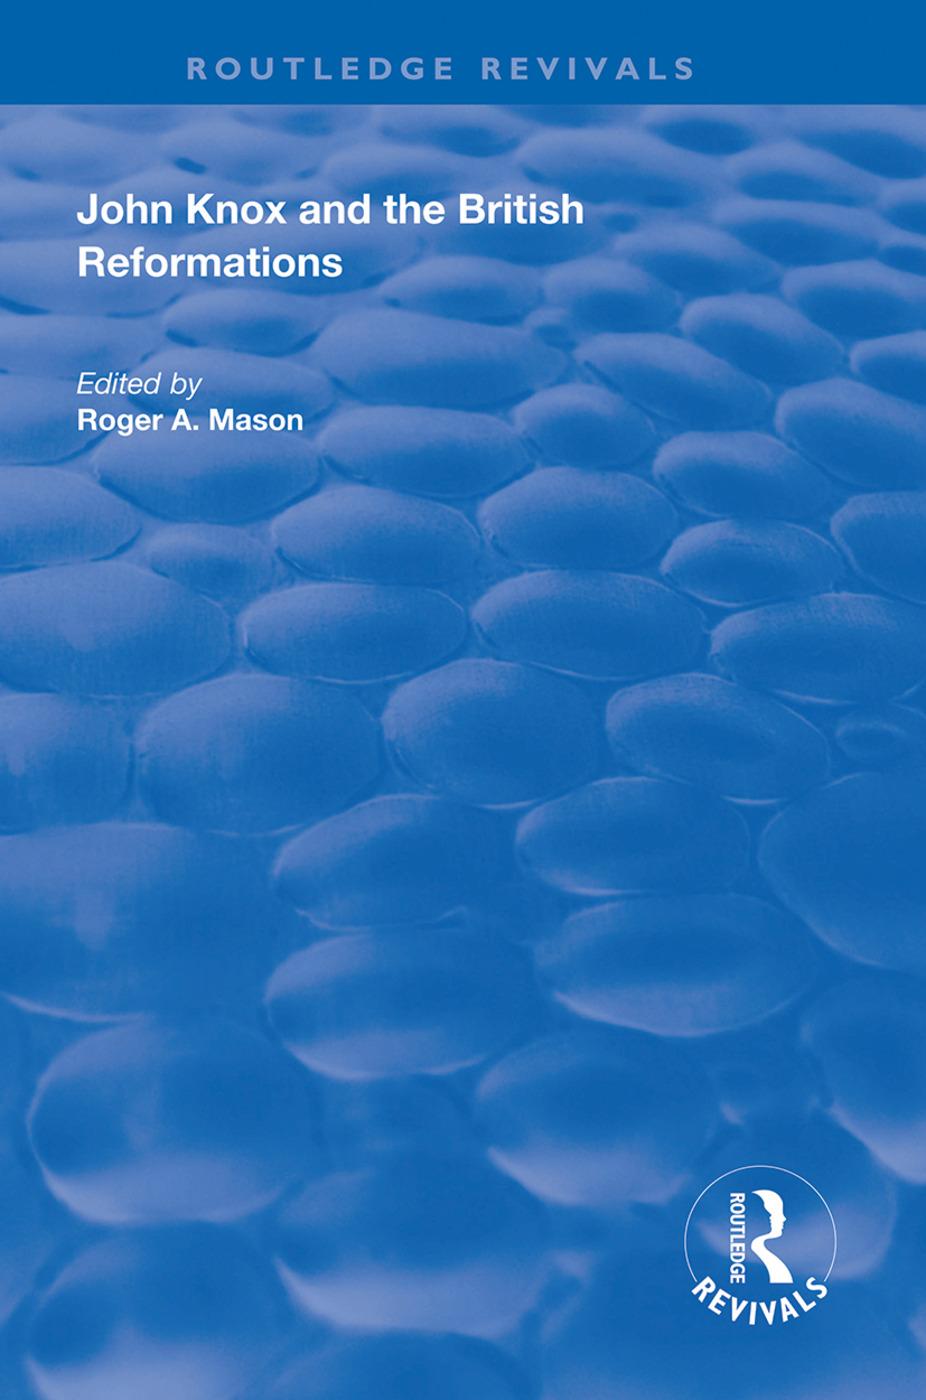 John Knox and the British Reformations